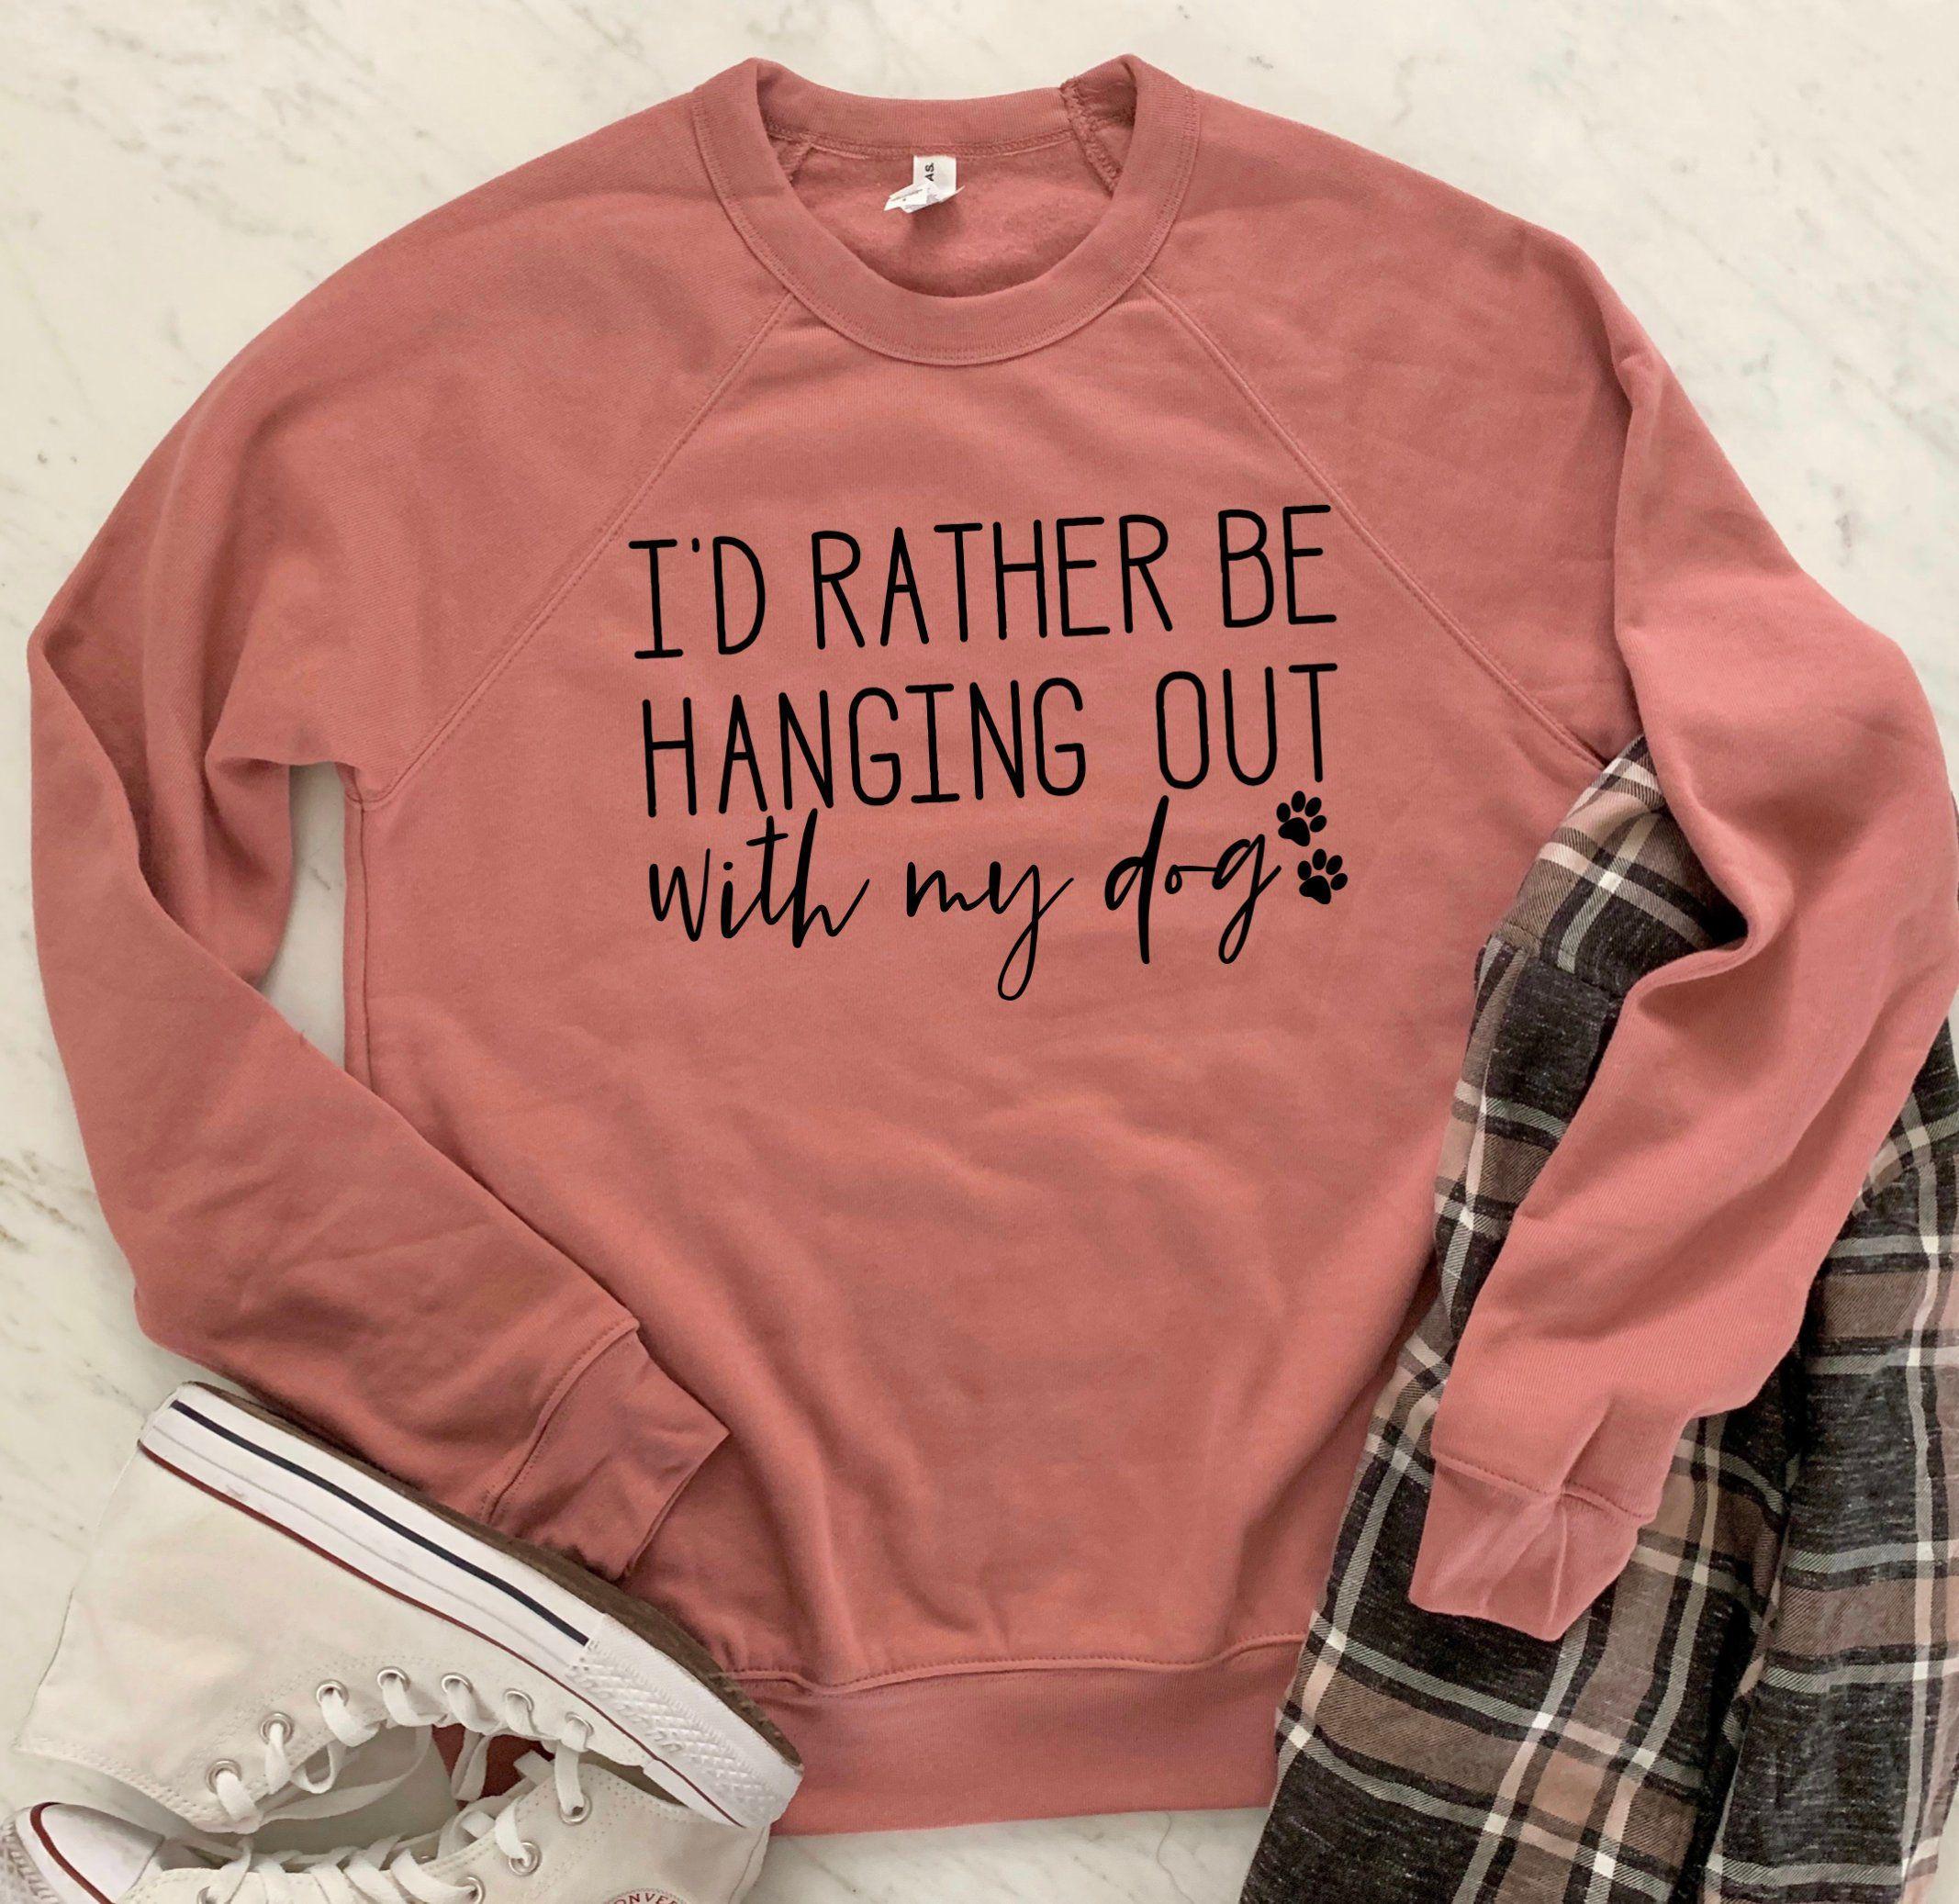 e2b3f5db WITH MY DOG, T Shirt, Acid Wash, Lightweight Pullover or Sweatshirt,  Unisex, Dog Mom Shirt, I Love My Dog Shirt, Dog Dad Shirt, Dog Lover by  happytops on ...